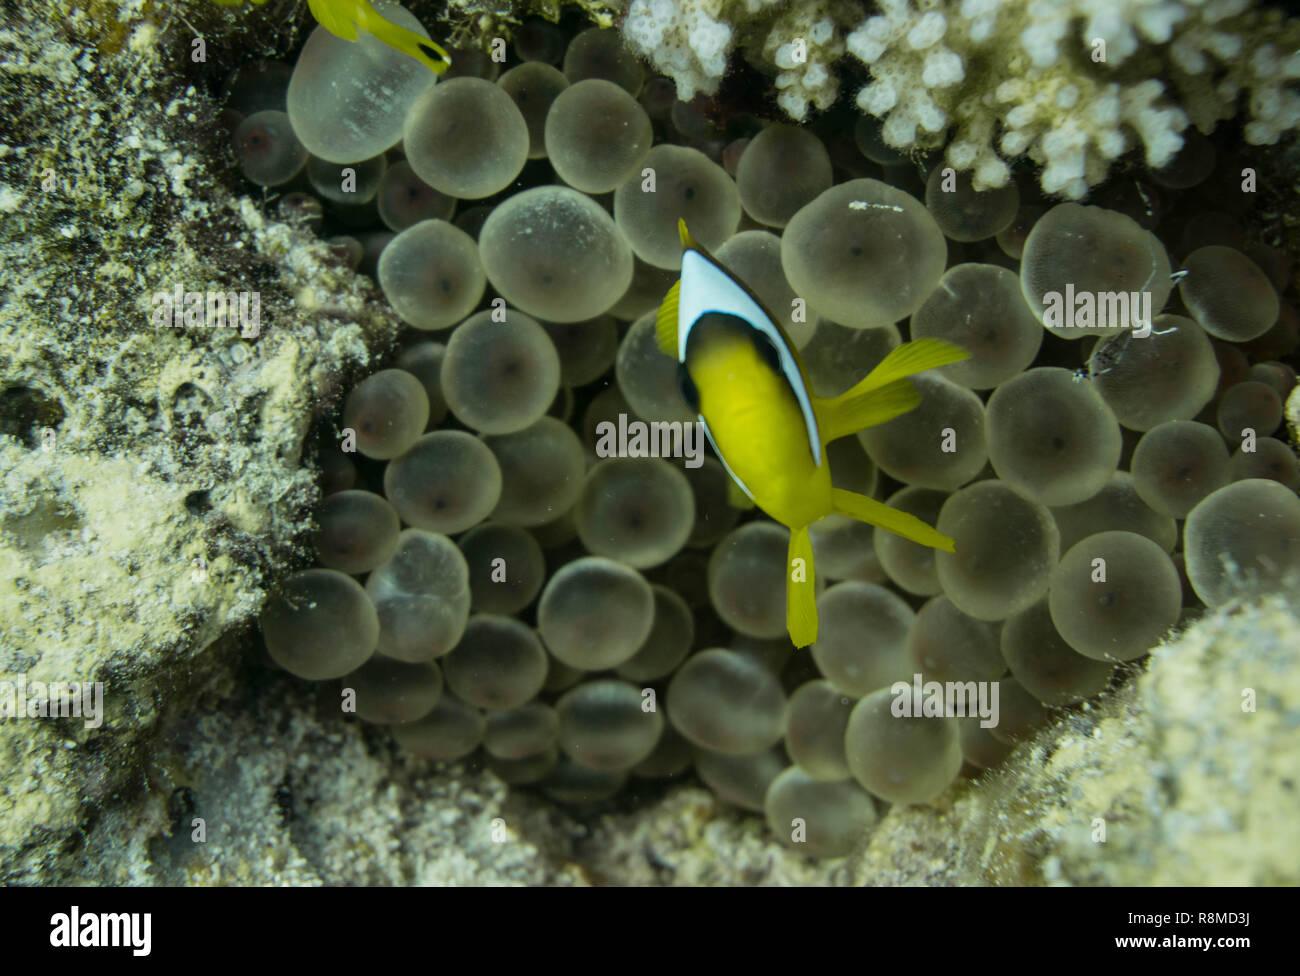 1-wöchige Tauchsafari am Roten Meer, Marsa Alam en Ägypten Foto de stock